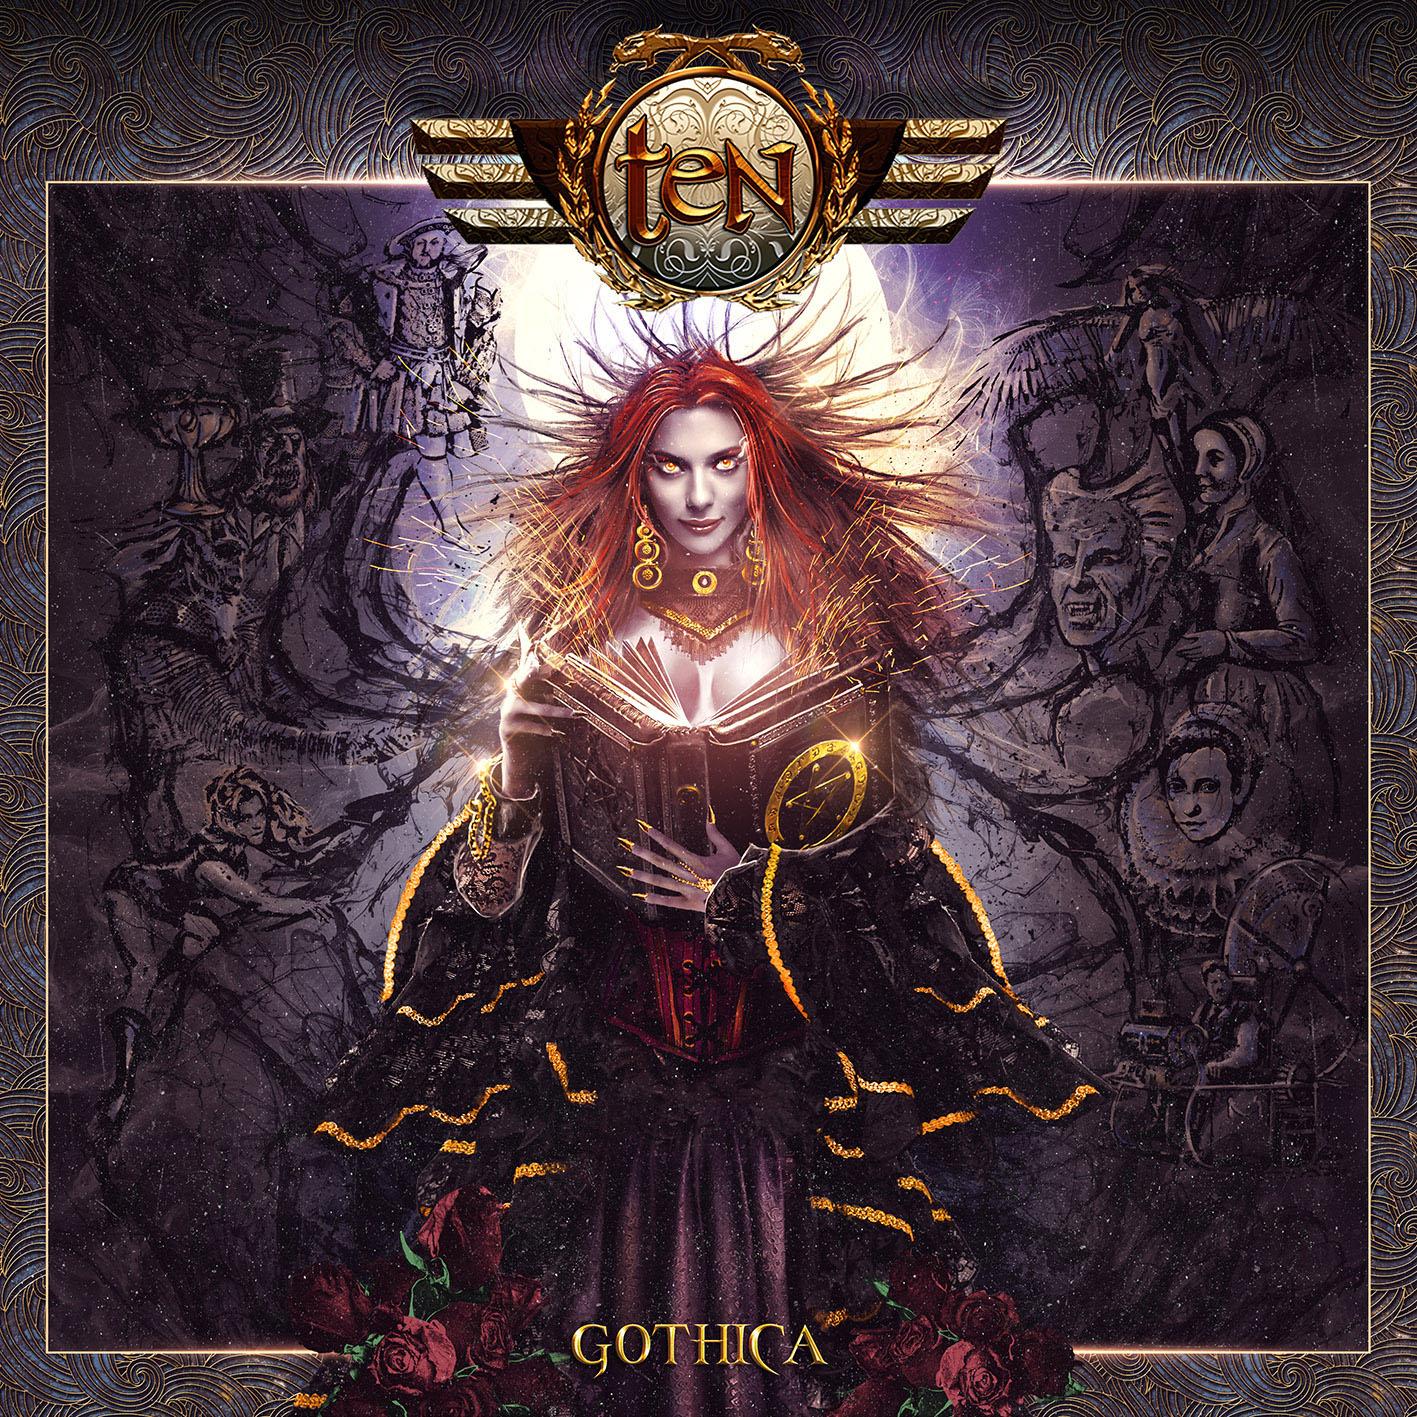 TEN gothica COVER